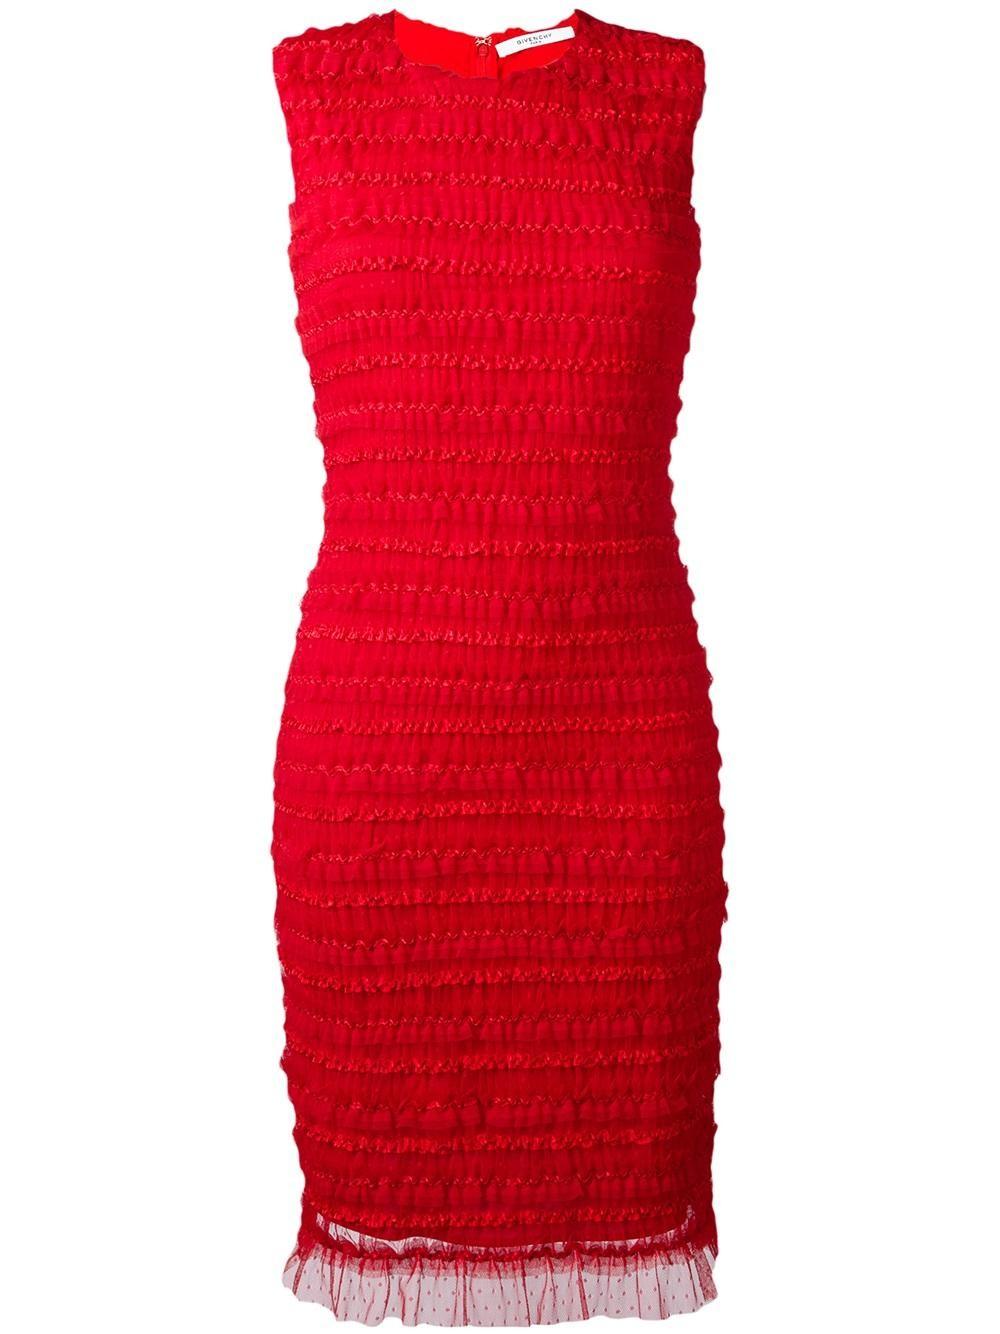 Givenchy Dresses ruffle embellished pencil dress